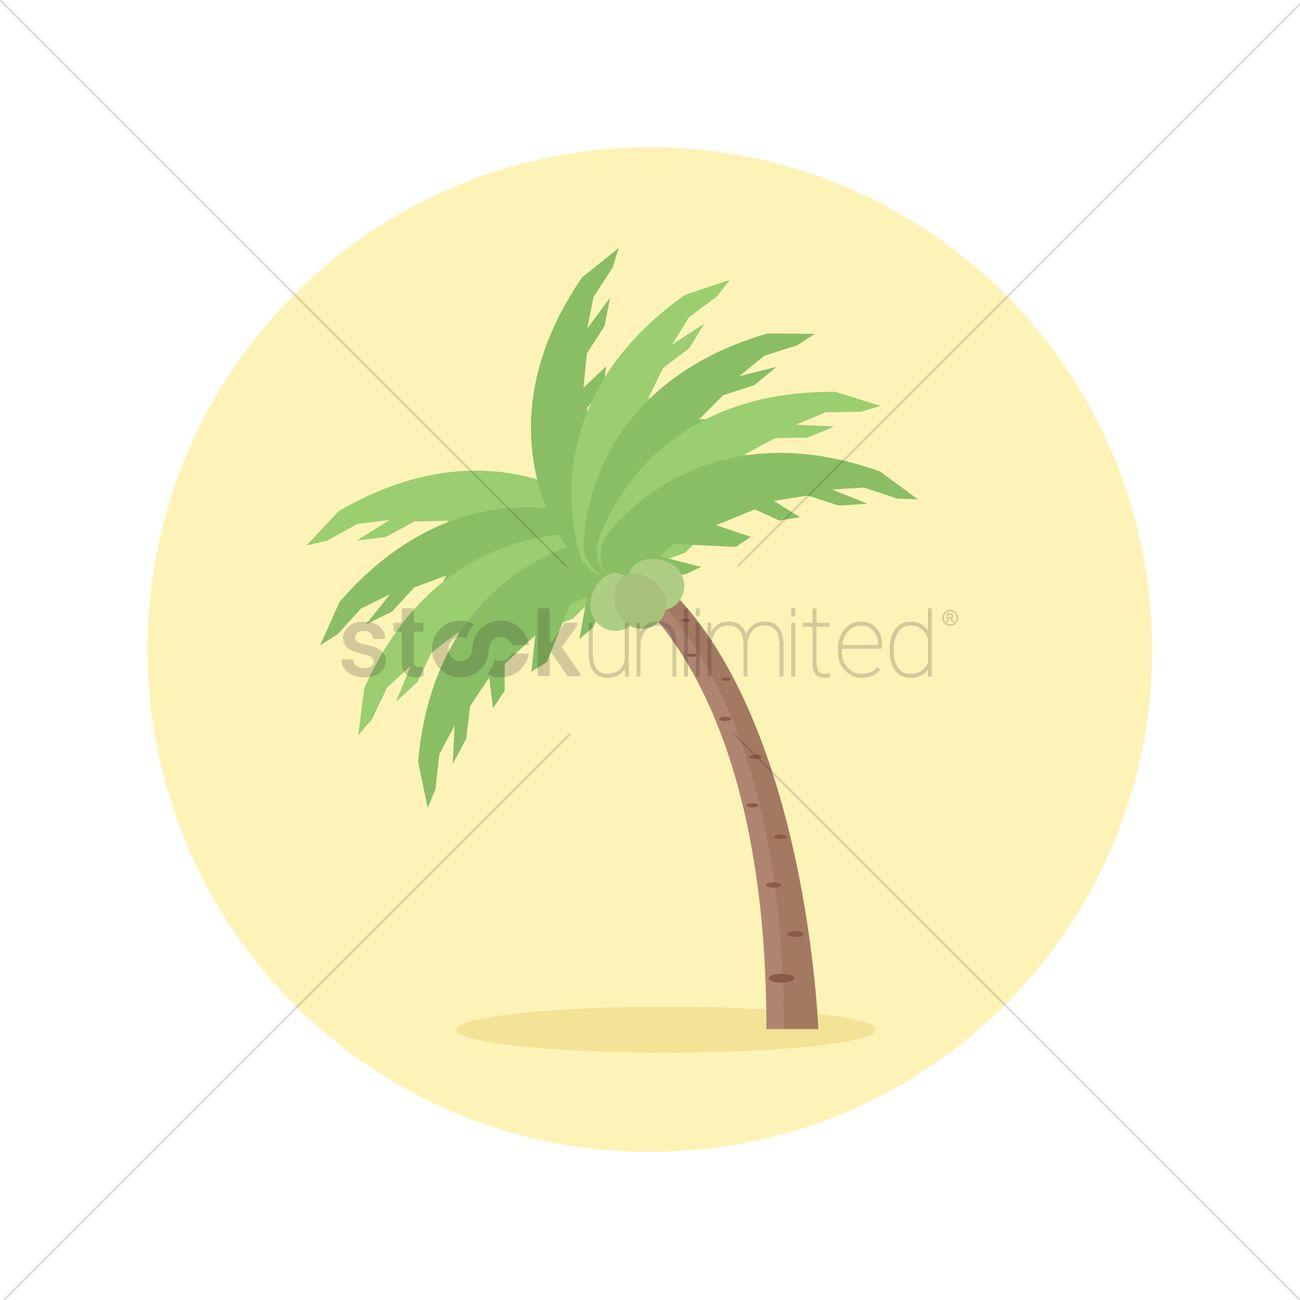 Coconut tree icon Vector Image - 1285096 | StockUnlimited